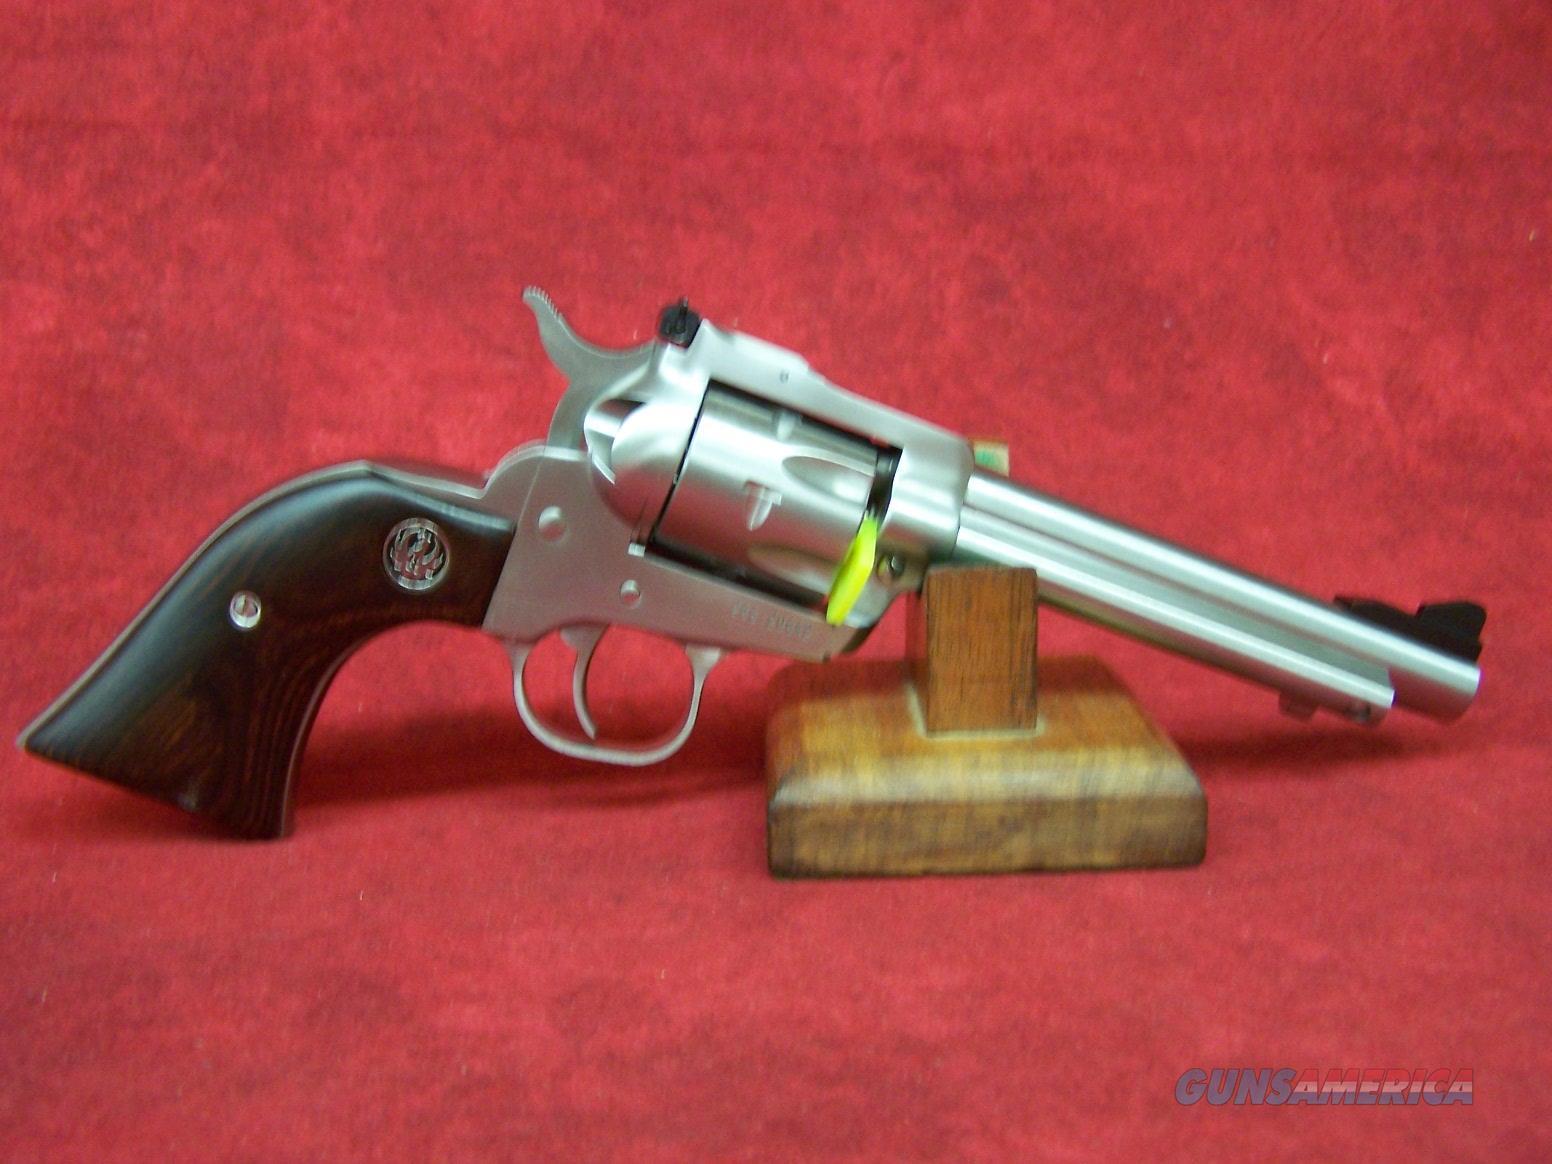 "Ruger Single Six Convertible .22 LR /.22 WMR 5.5"" SS Barrel  (00625)  Guns > Pistols > Ruger Single Action Revolvers > Single Six Type"